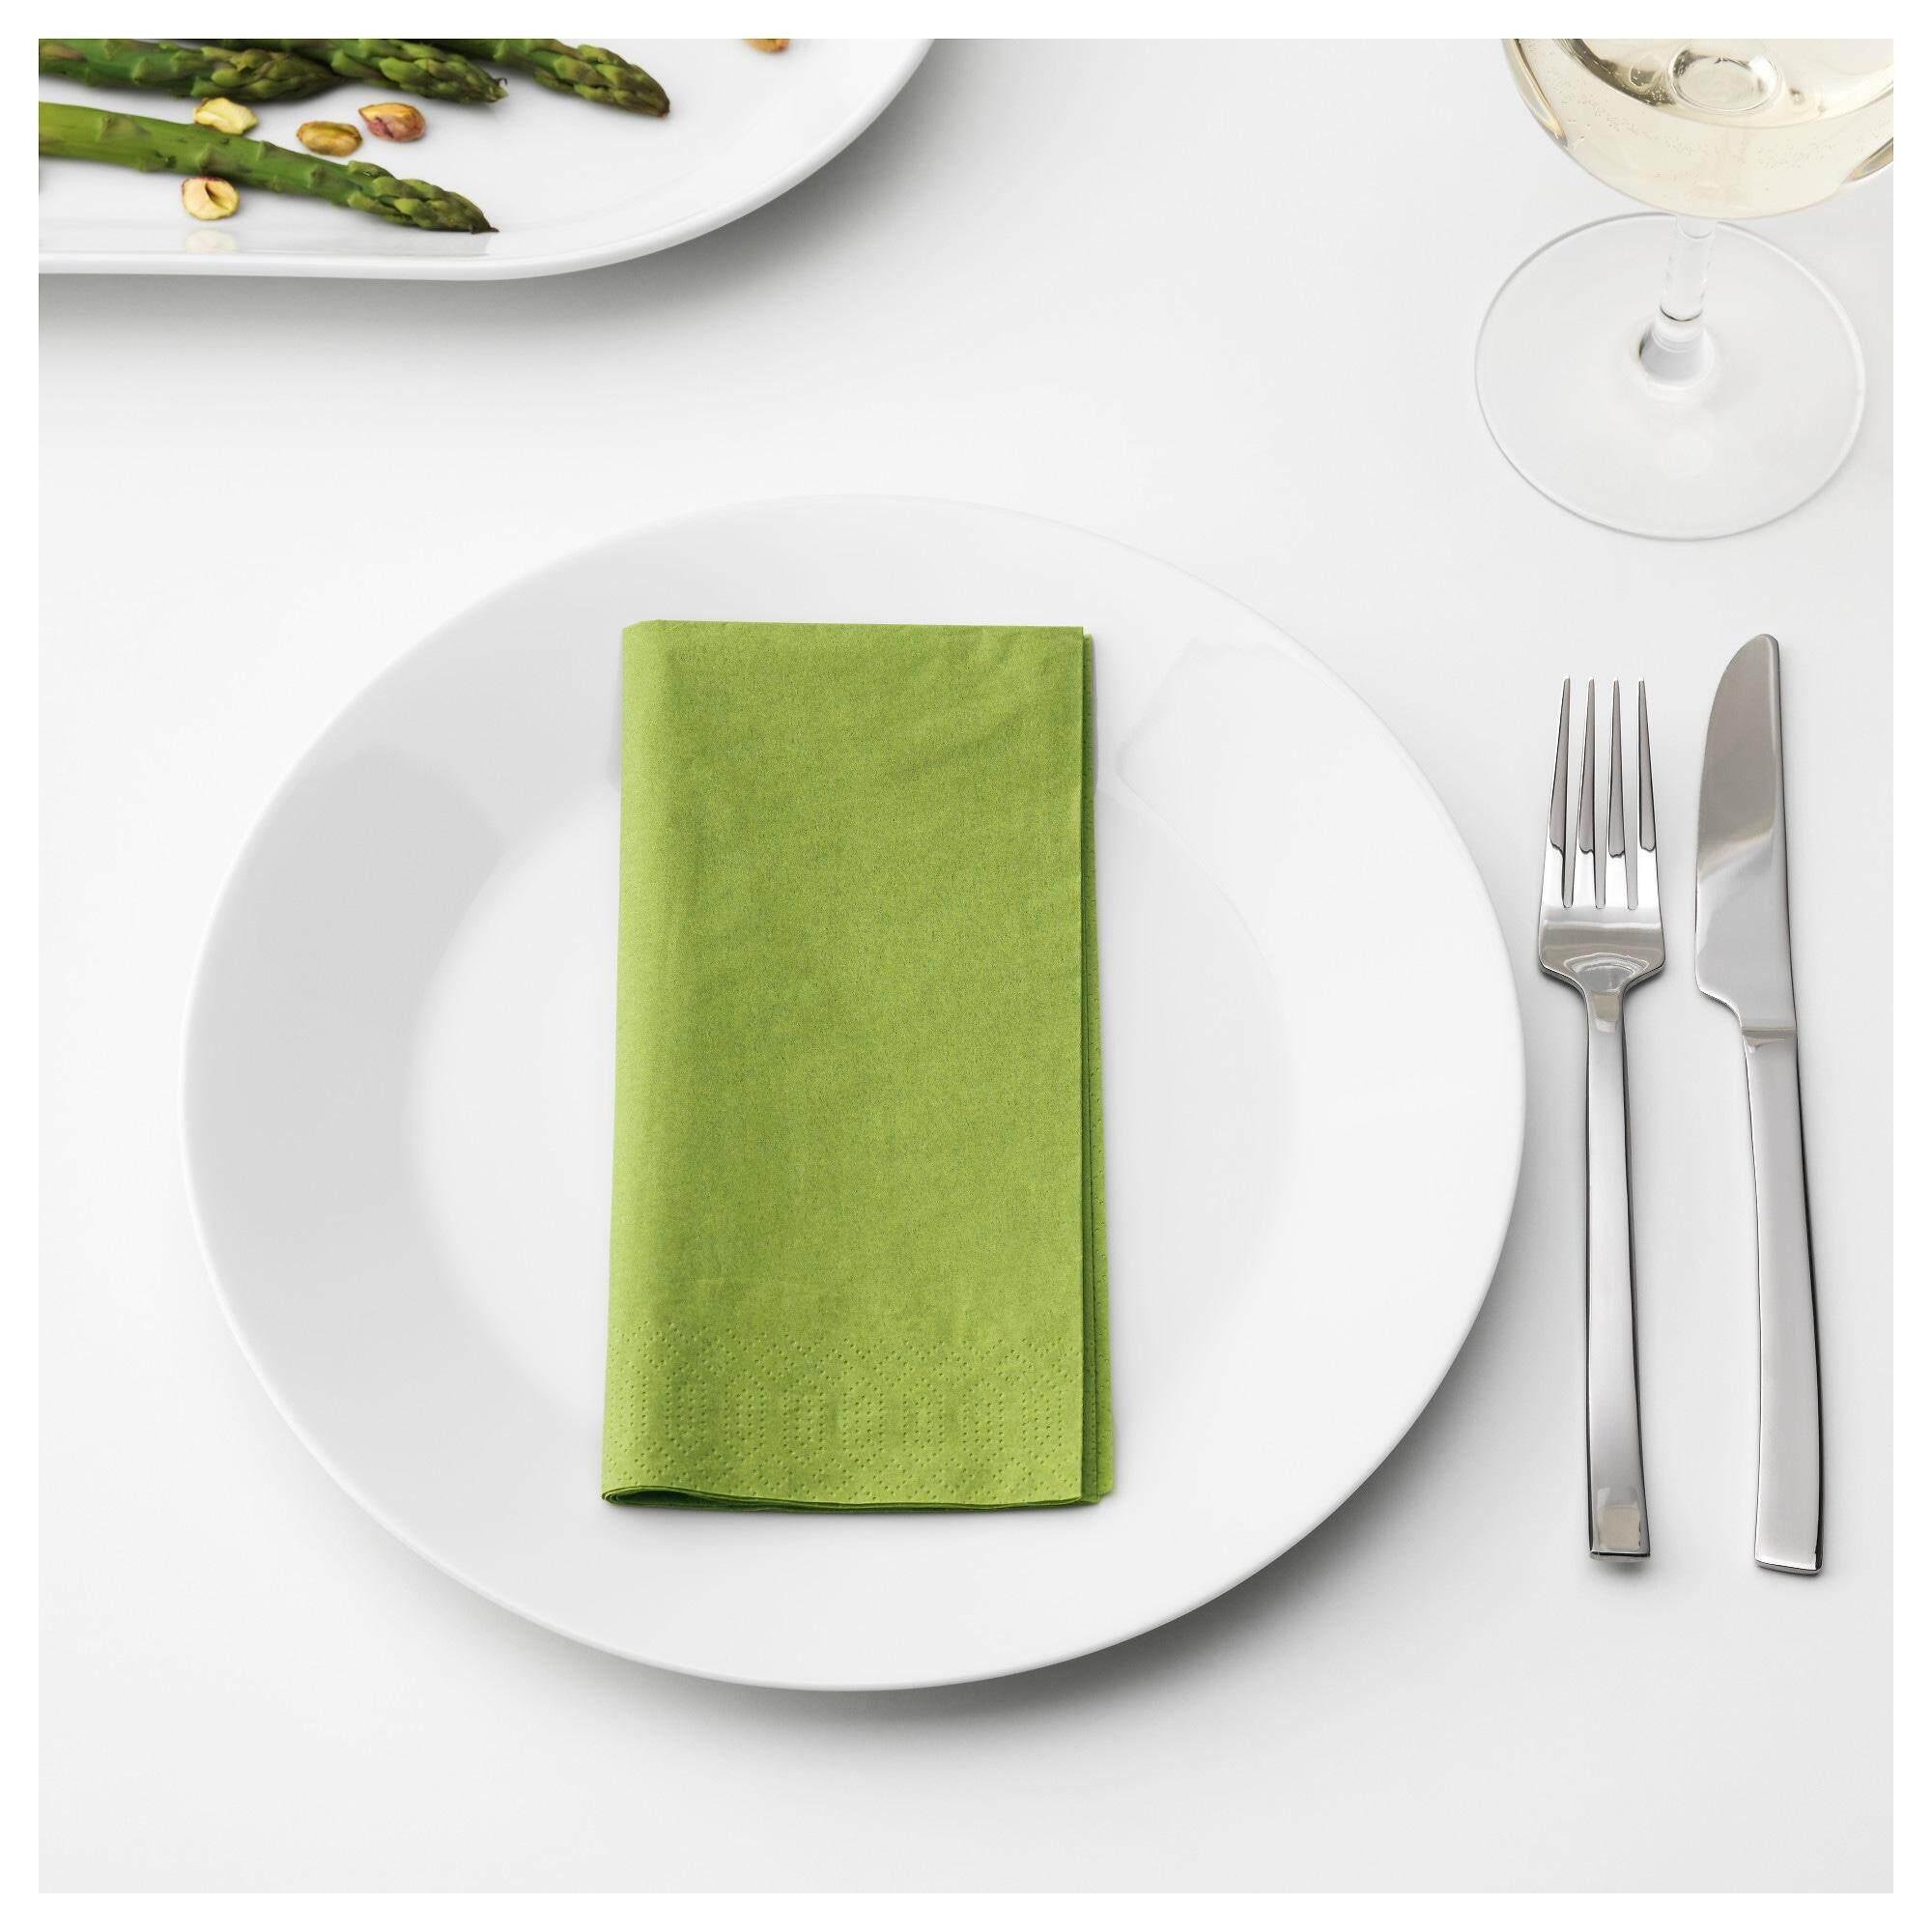 Fantastisk ฟันทัสติสค์ กระดาษเช็ดปาก มีเดียมกรีน กระดาษเช็ดปากหนา 3 ชั้น จาก Ikea By Spa Land.